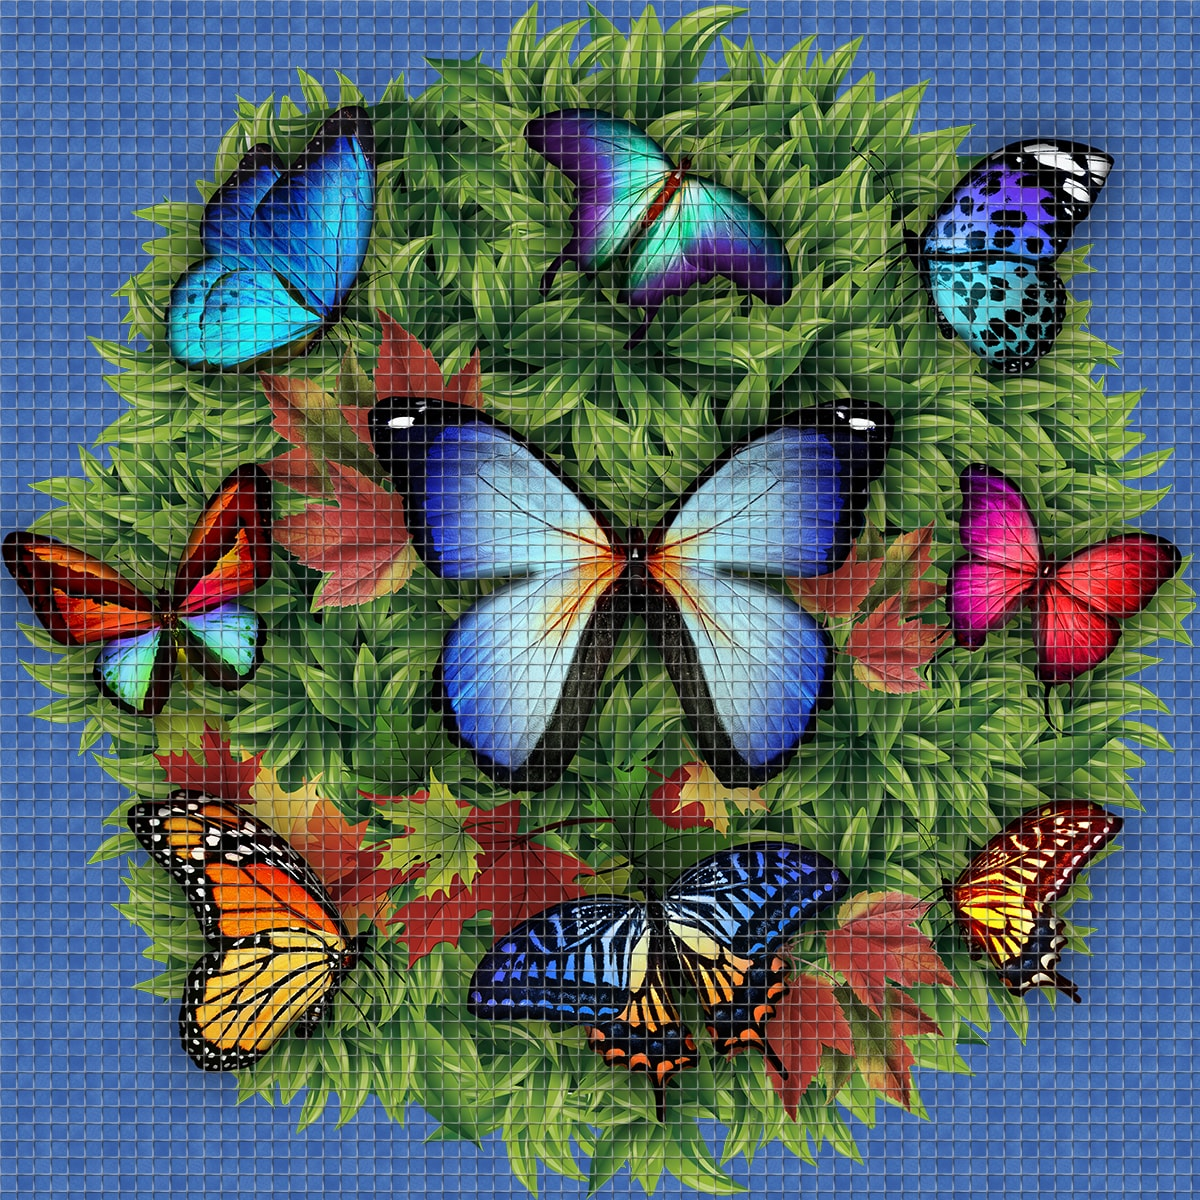 Butterflies-Digital_Print-Mosaic-Ezarri.jpg